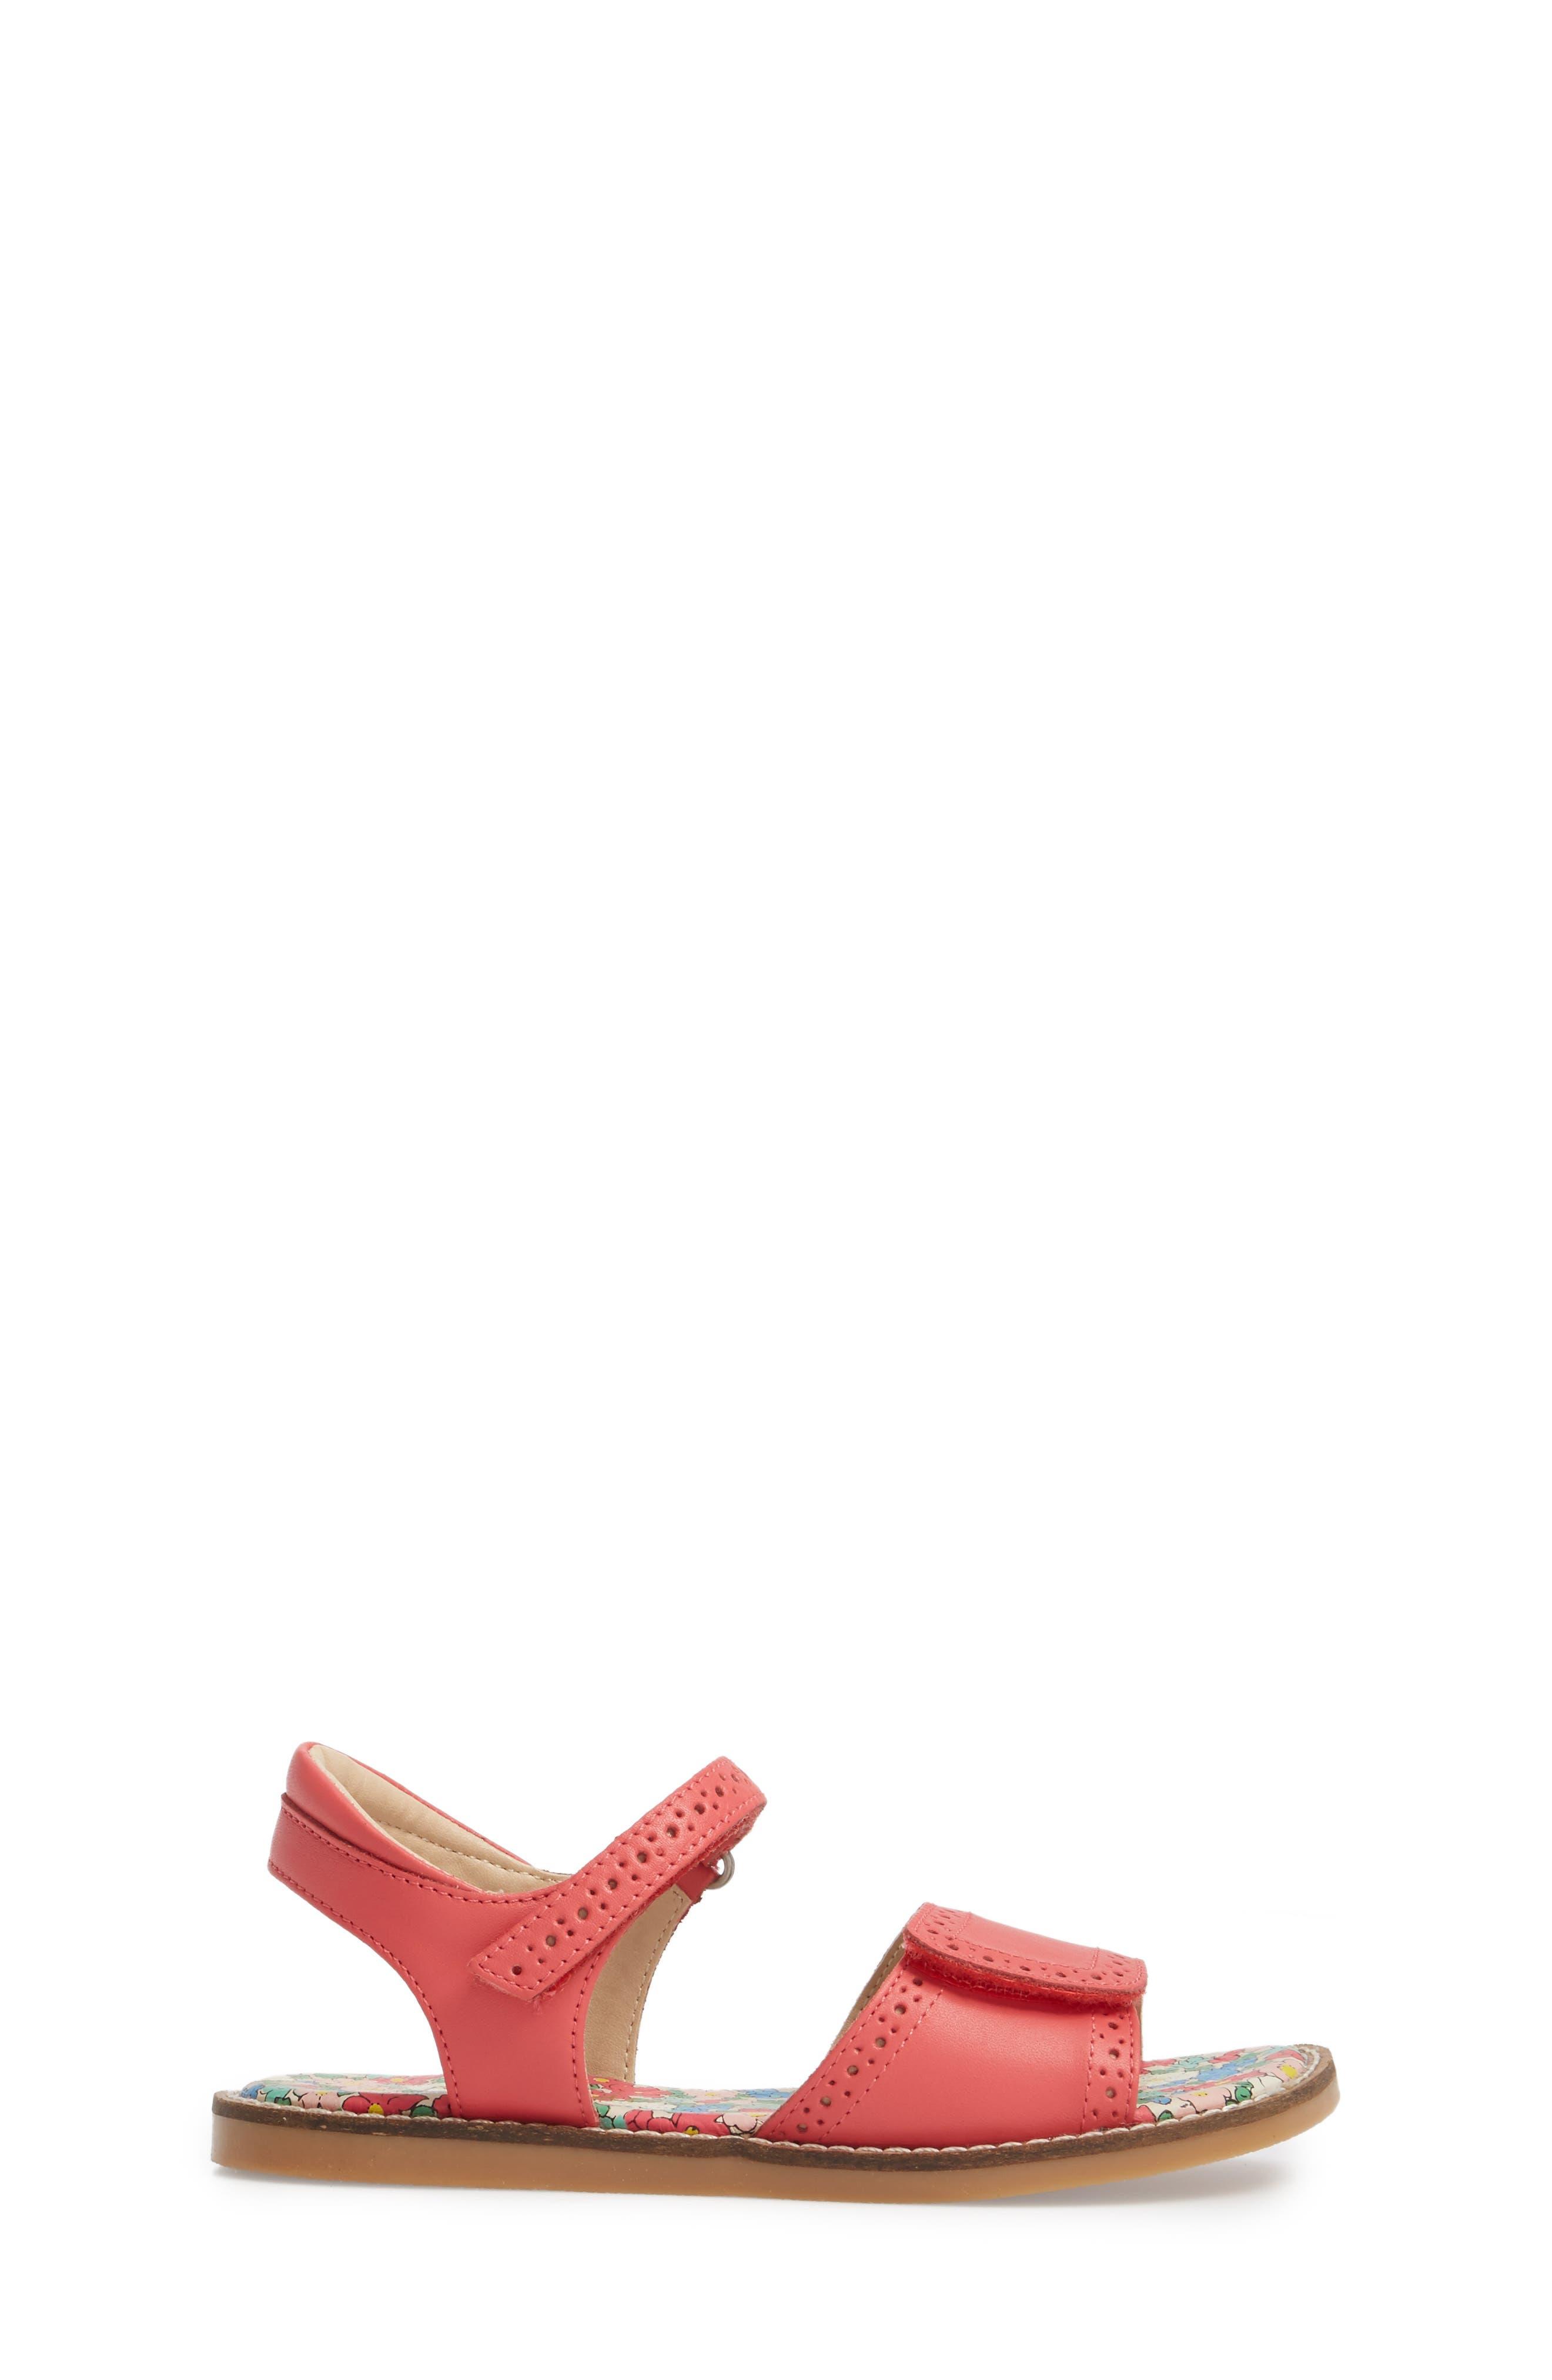 Adjustable Quarter Strap Sandal,                             Alternate thumbnail 6, color,